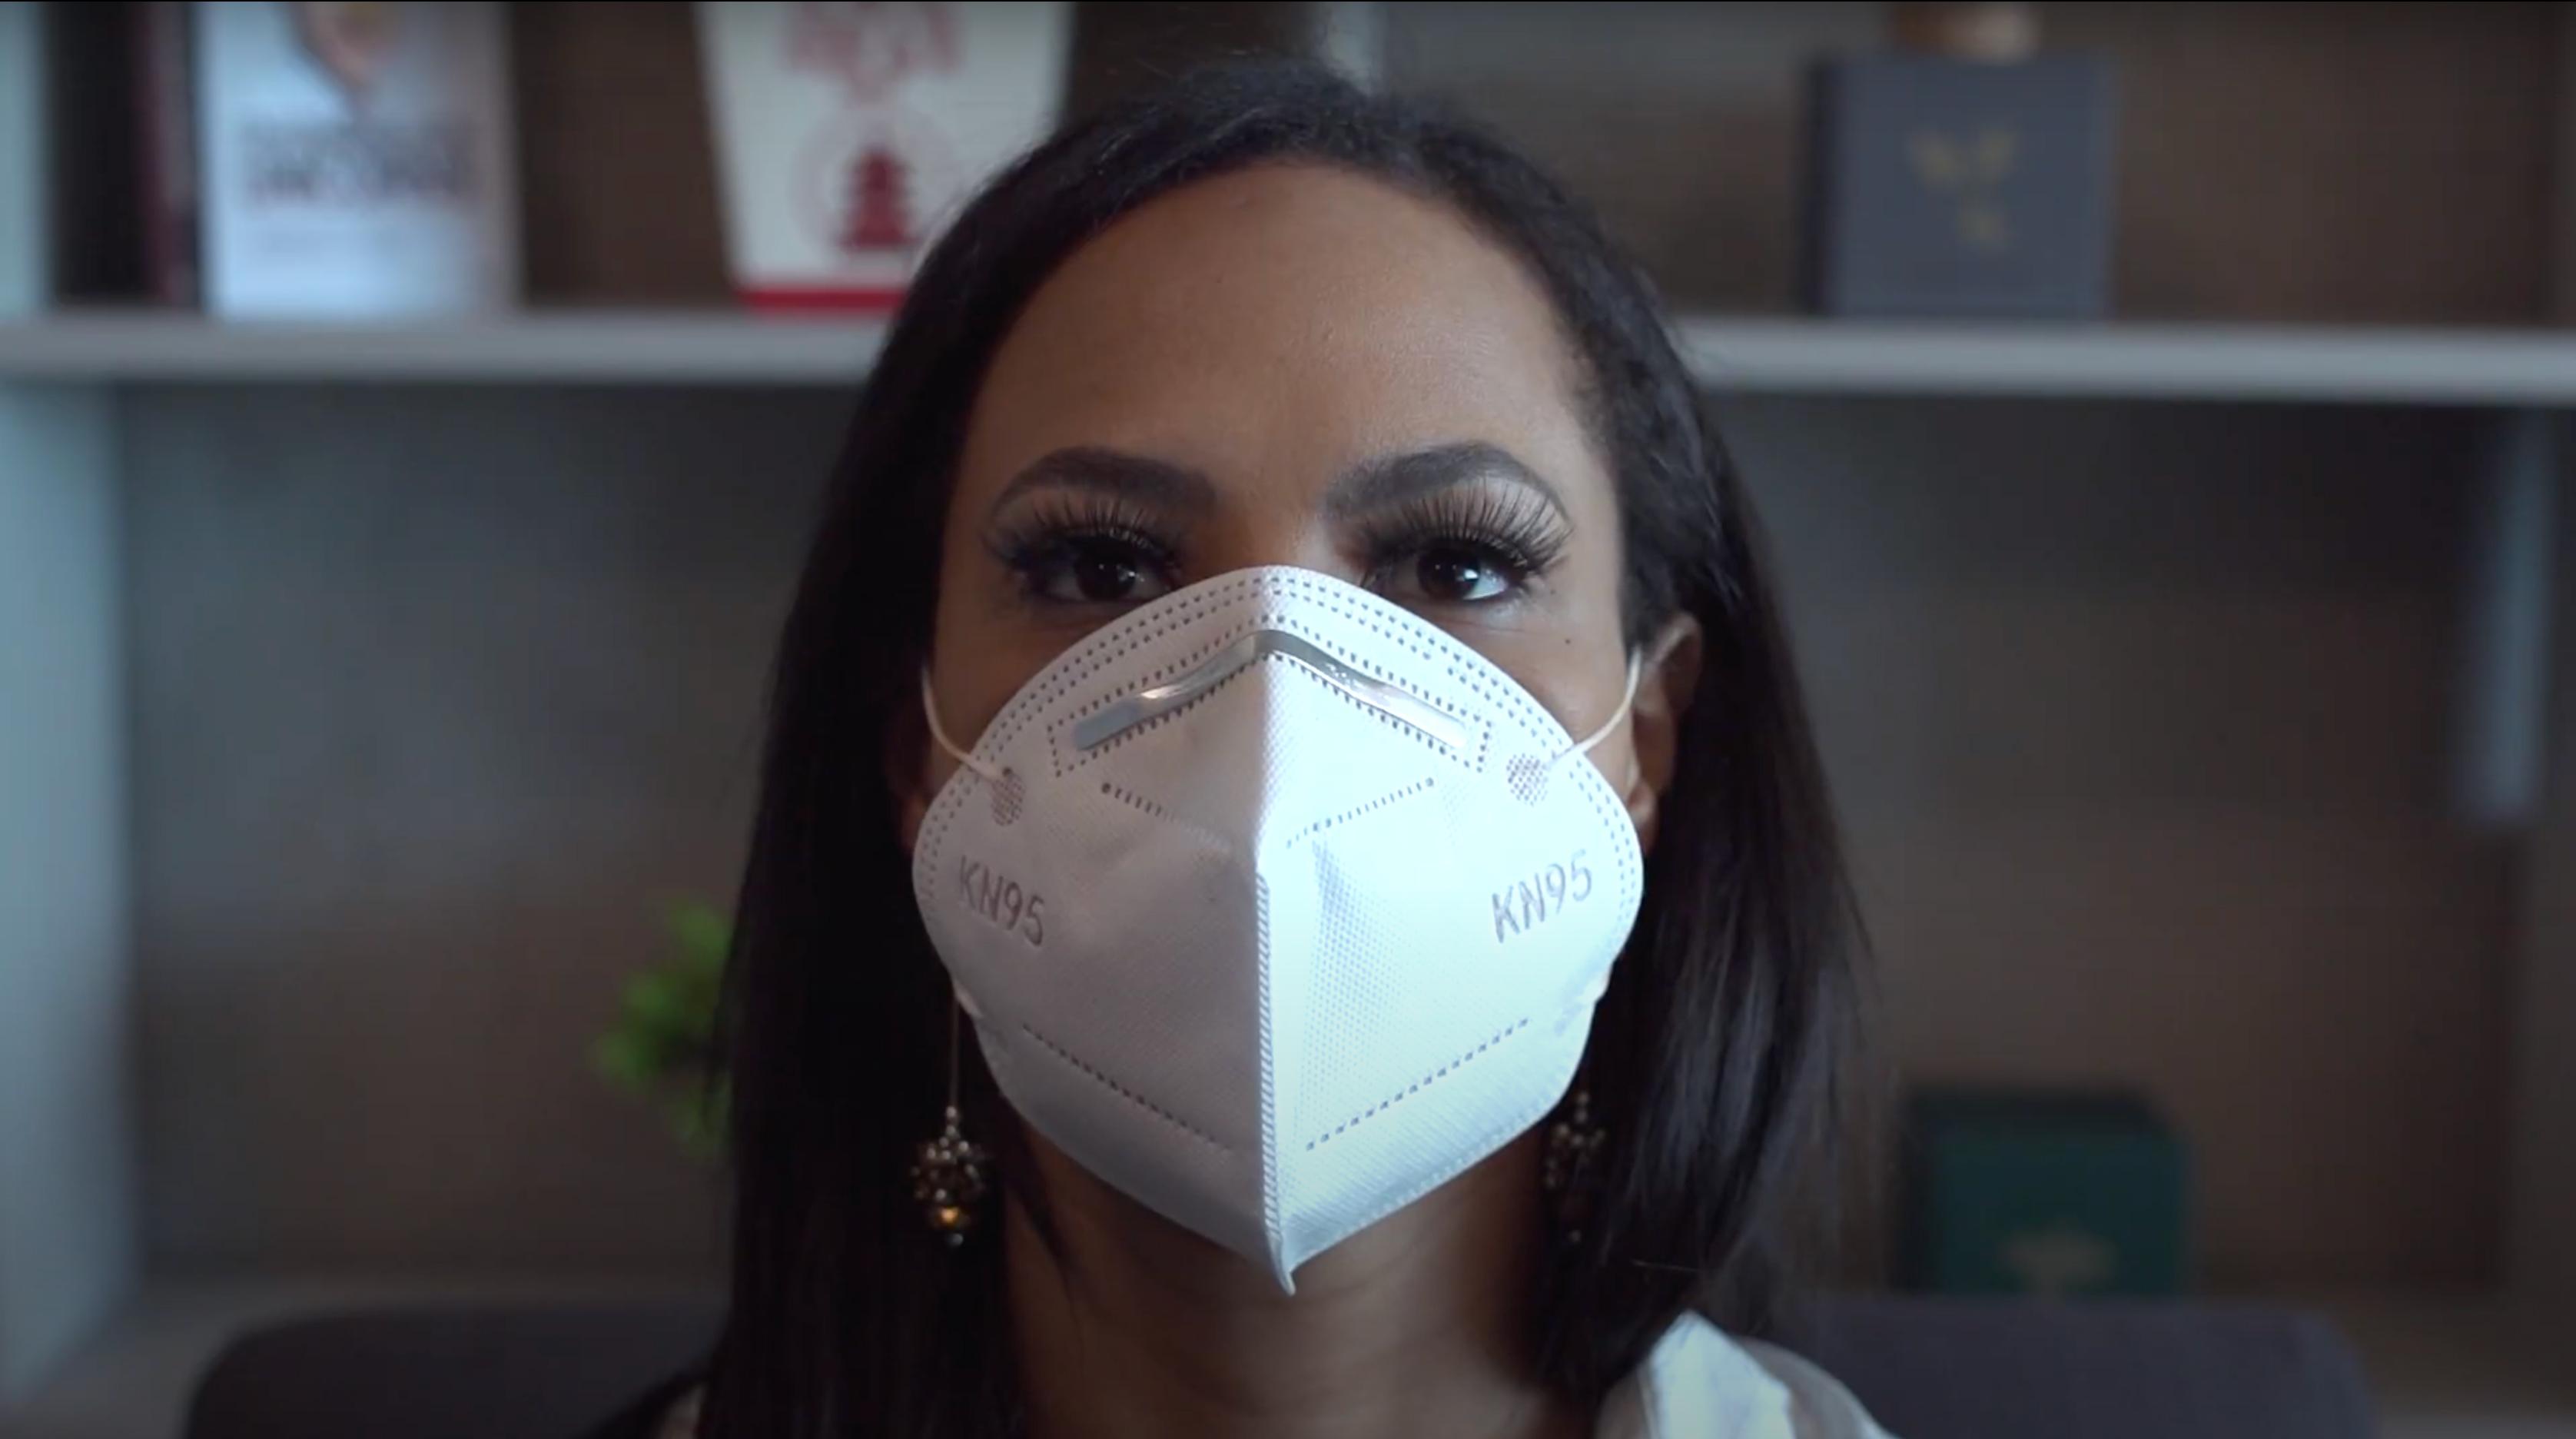 My Rode Reel 2020 - Al Menos Usamos Mascaras (At Least We're Wearing Masks)